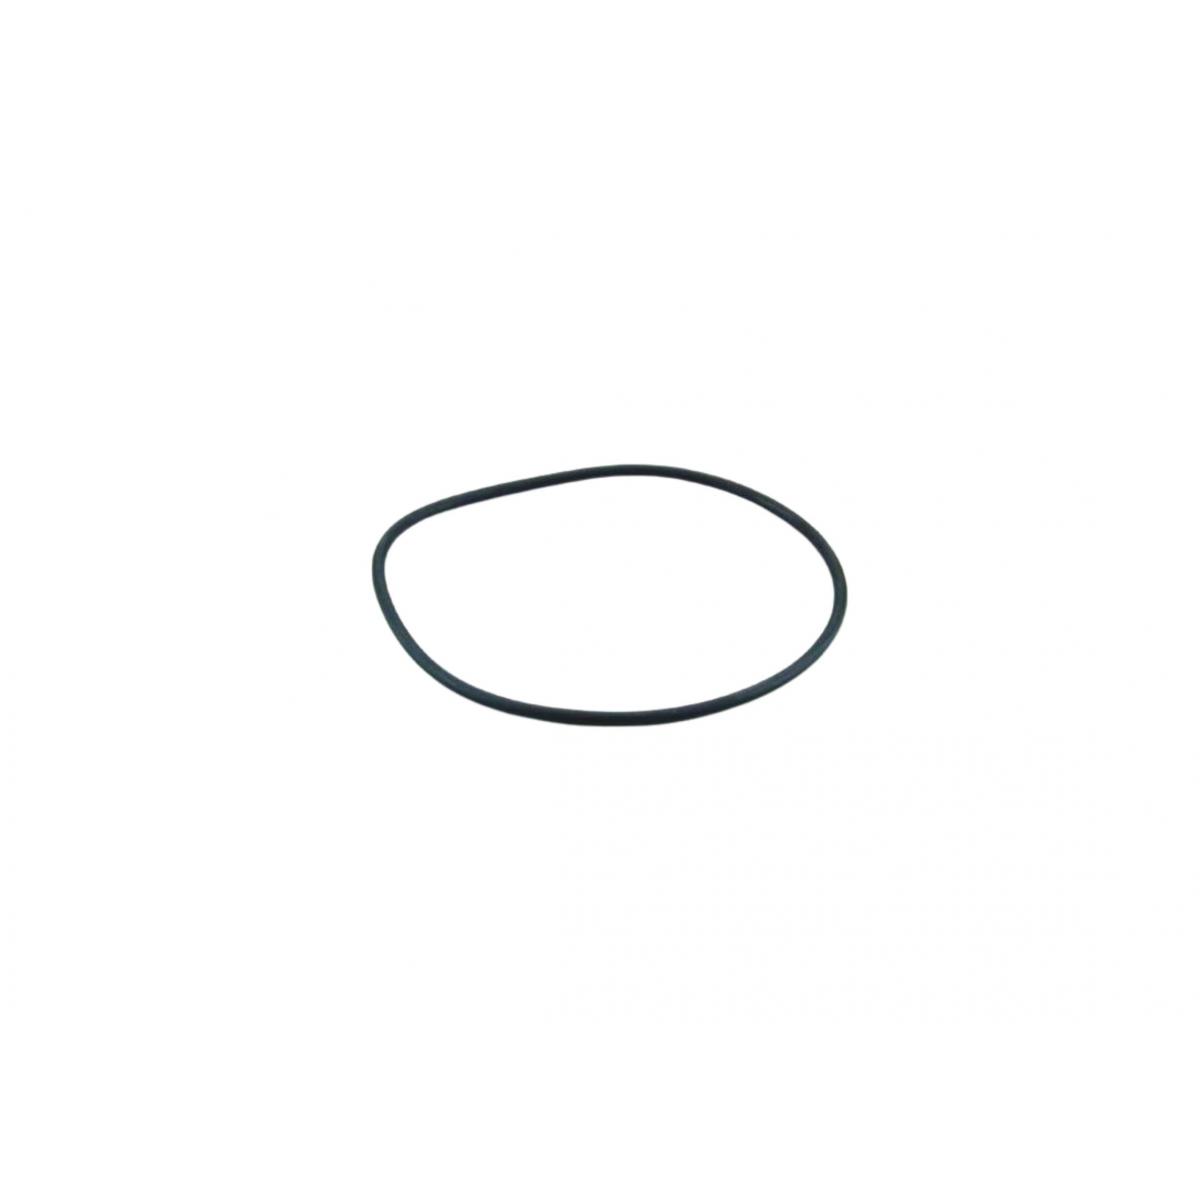 Lid 'O' Ring